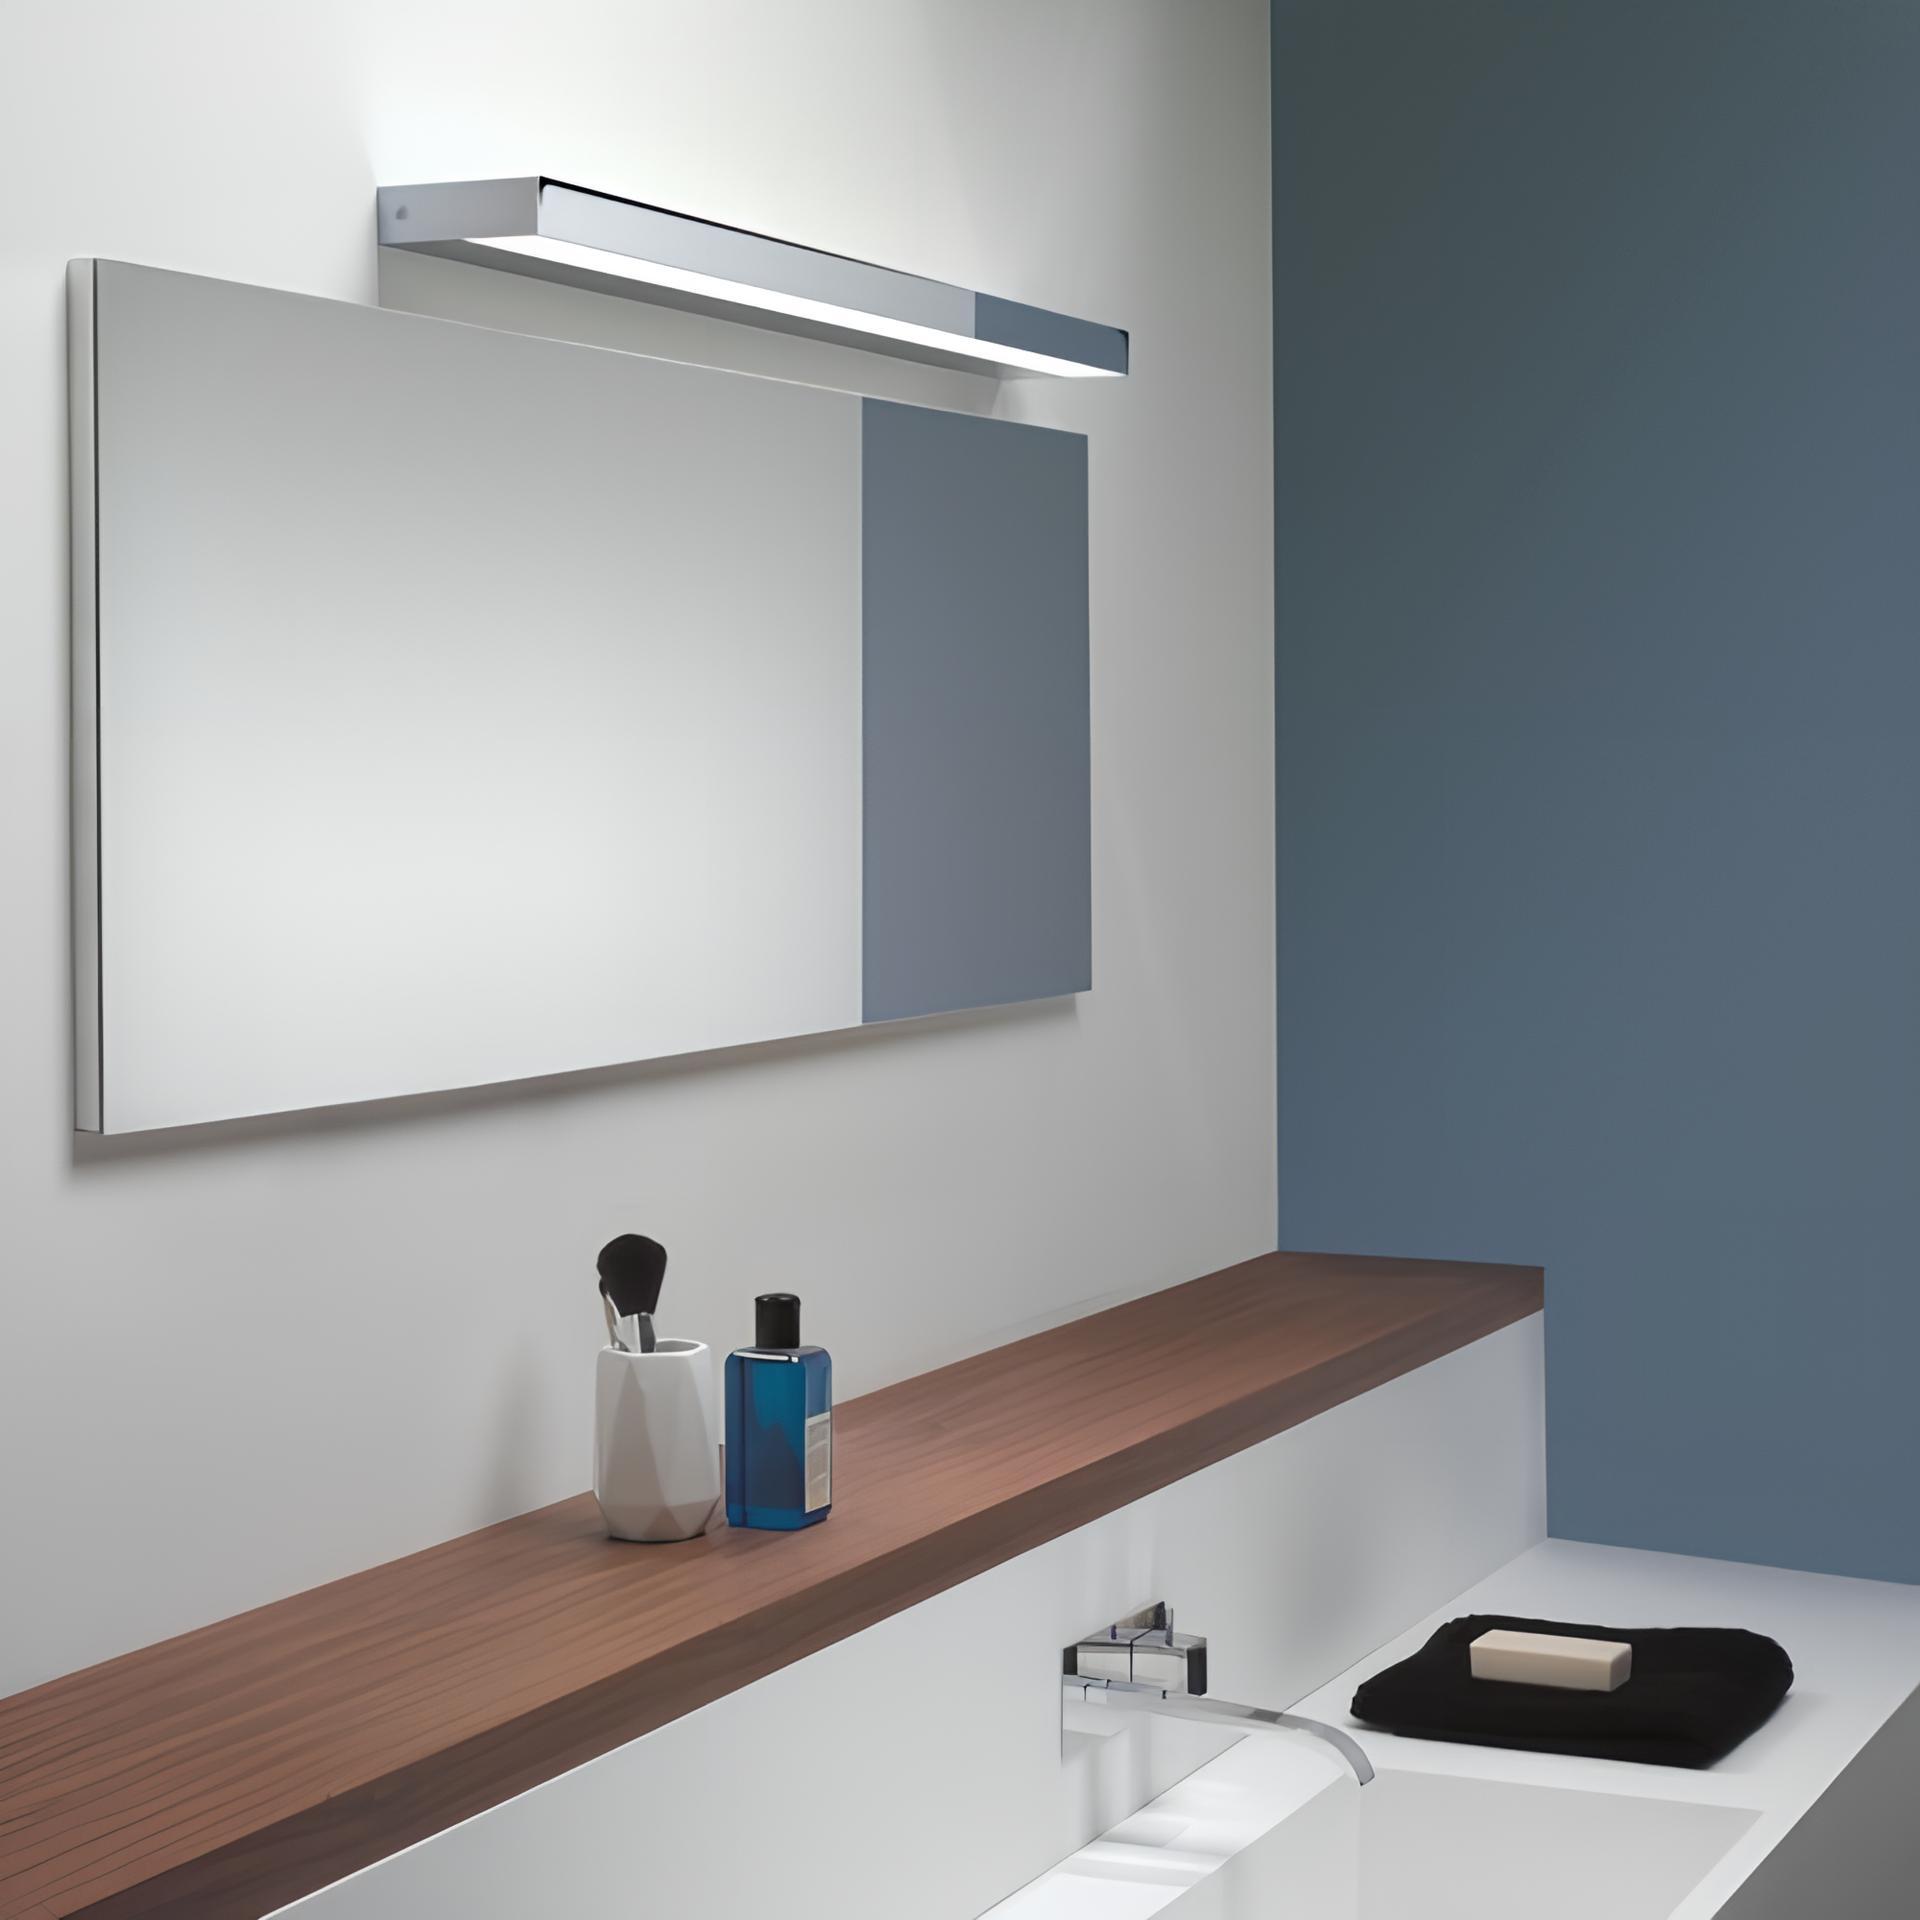 Axios Badezimmer Wandleuchte Led 600mm Perfecto Design